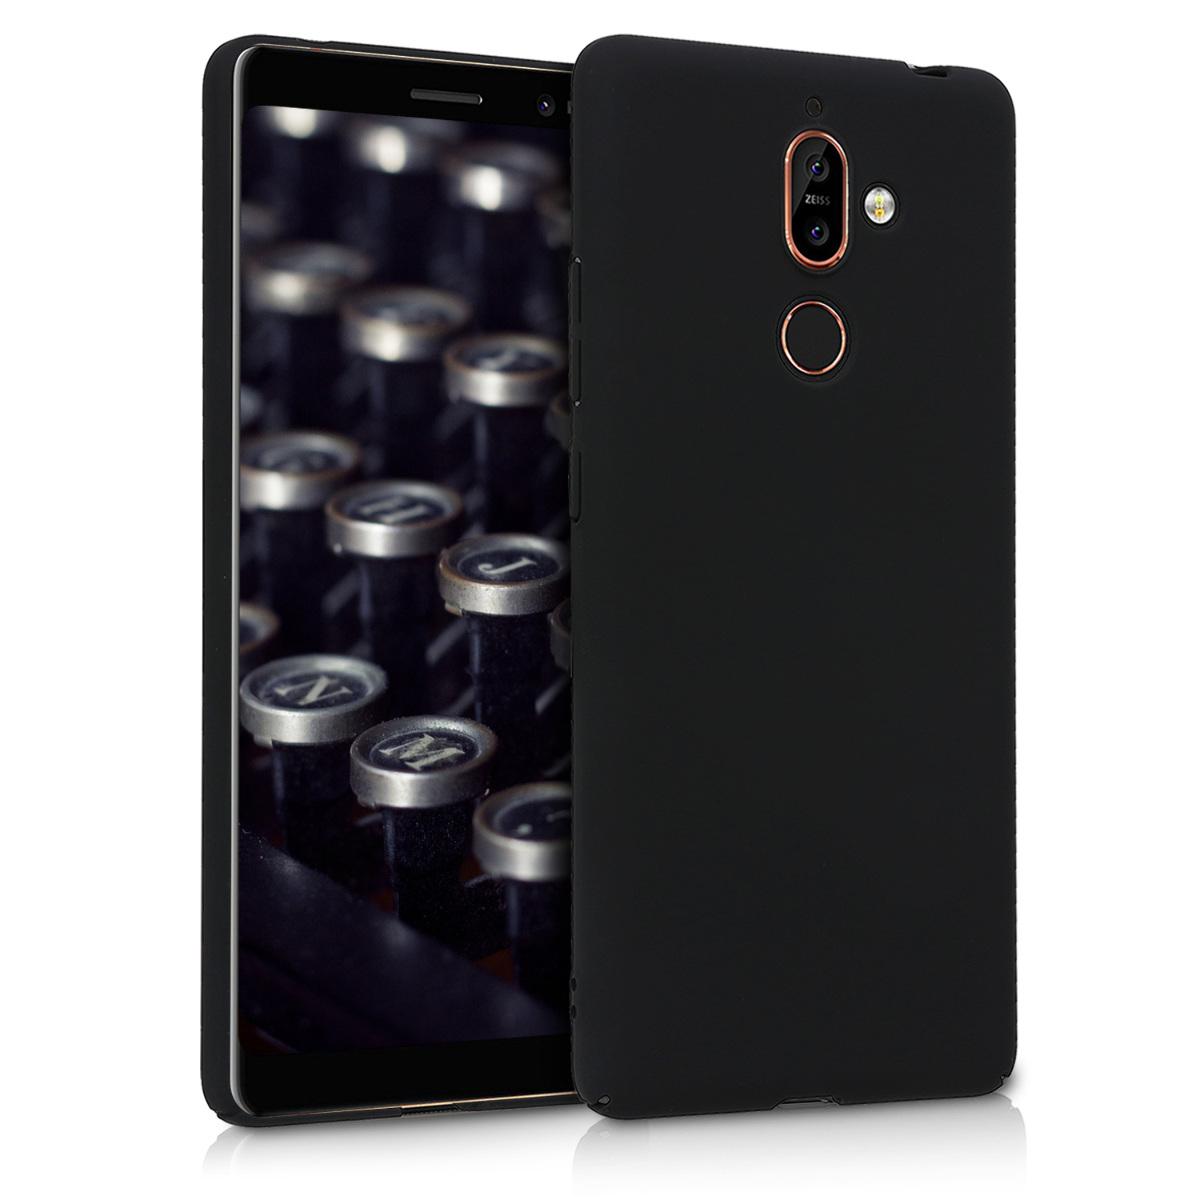 KW Θήκη Σιλικόνης Nokia 7 Plus - Black (45699.01)